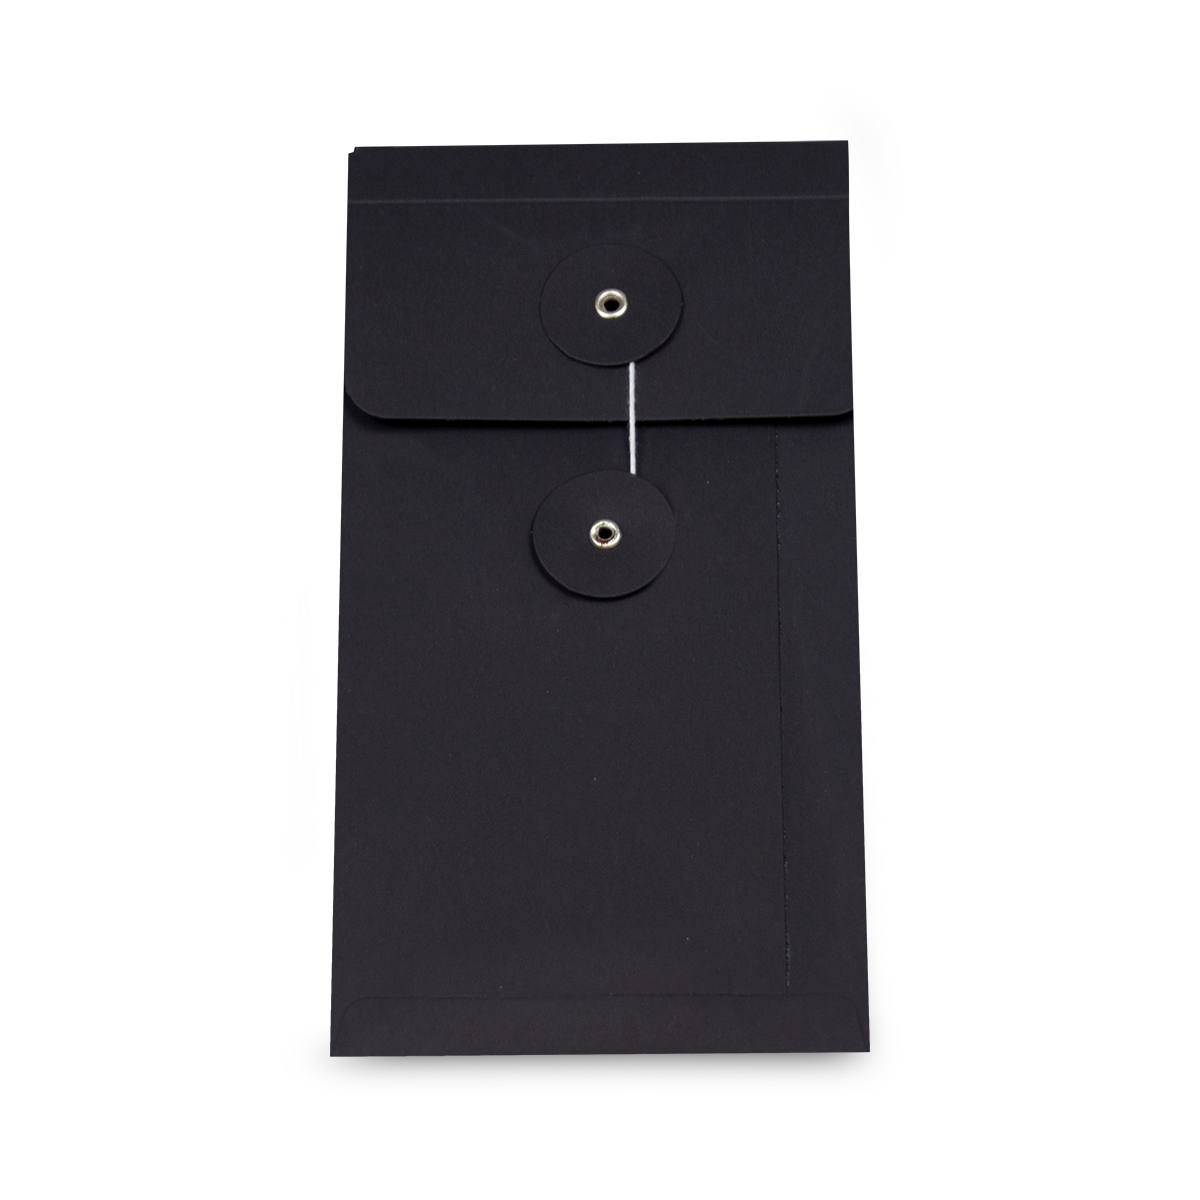 Envelope-JapanseSluiting-zwart-product